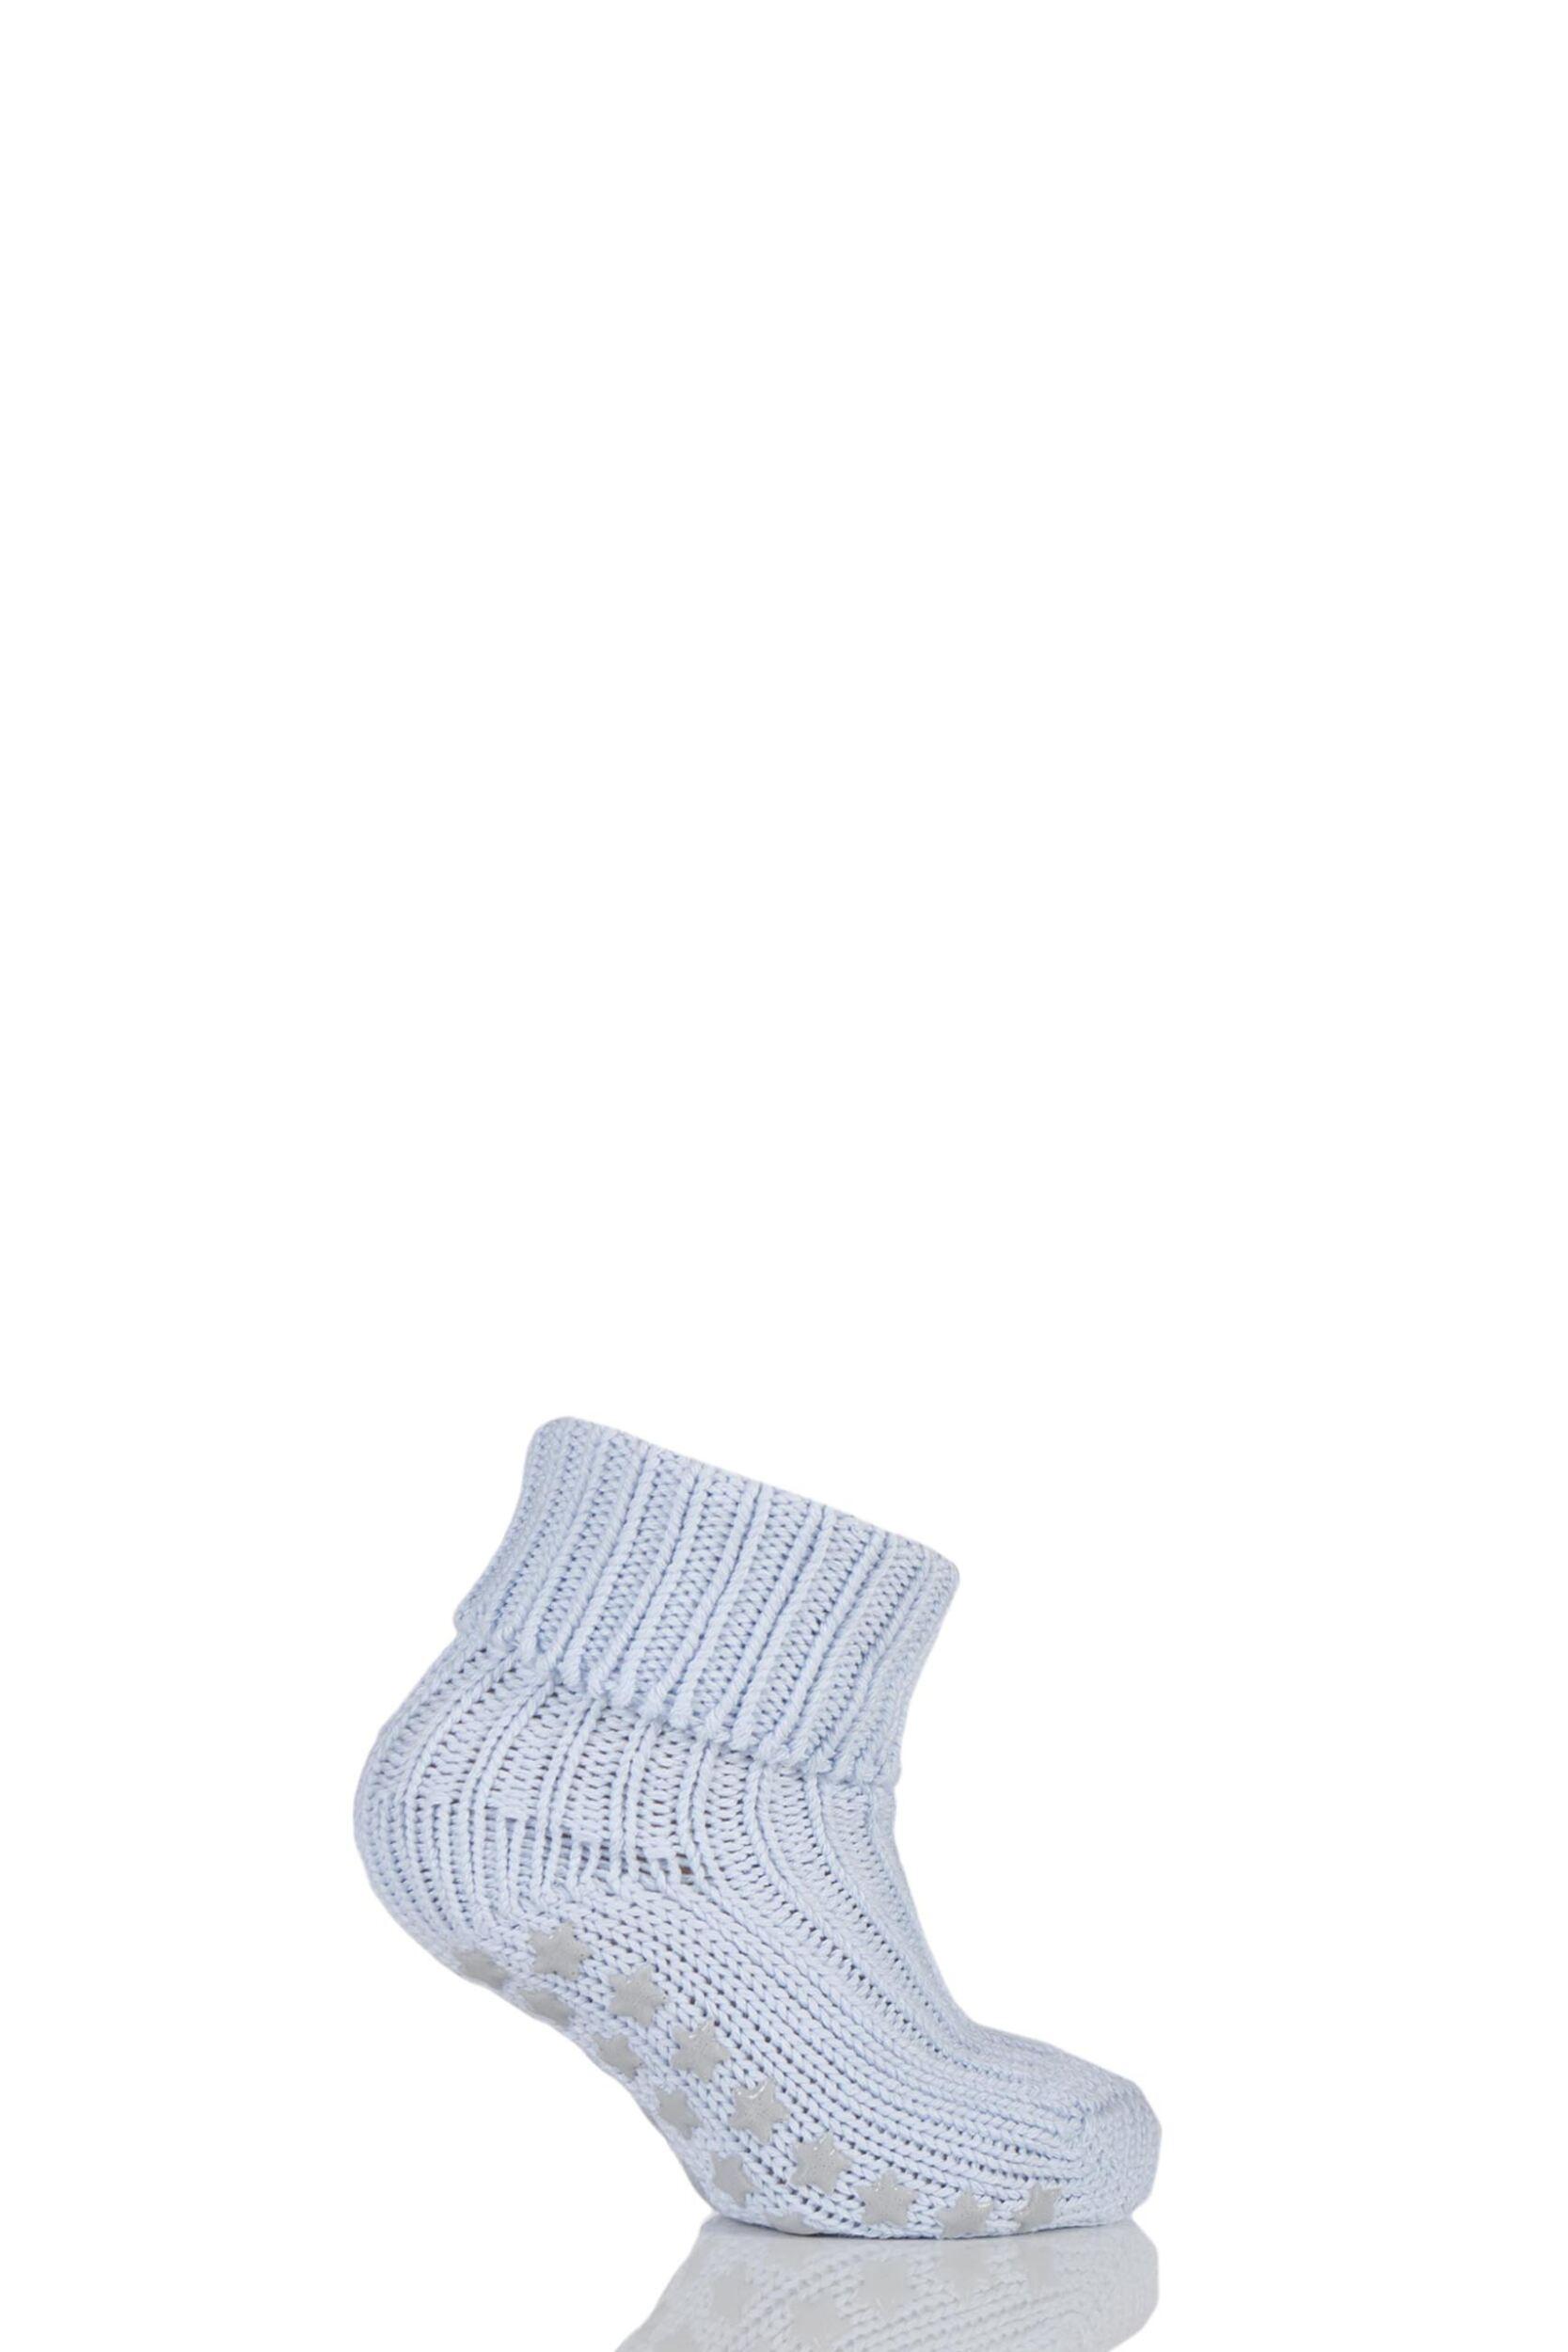 Image of Babies 1 Pair Falke Catspads Slipper Socks